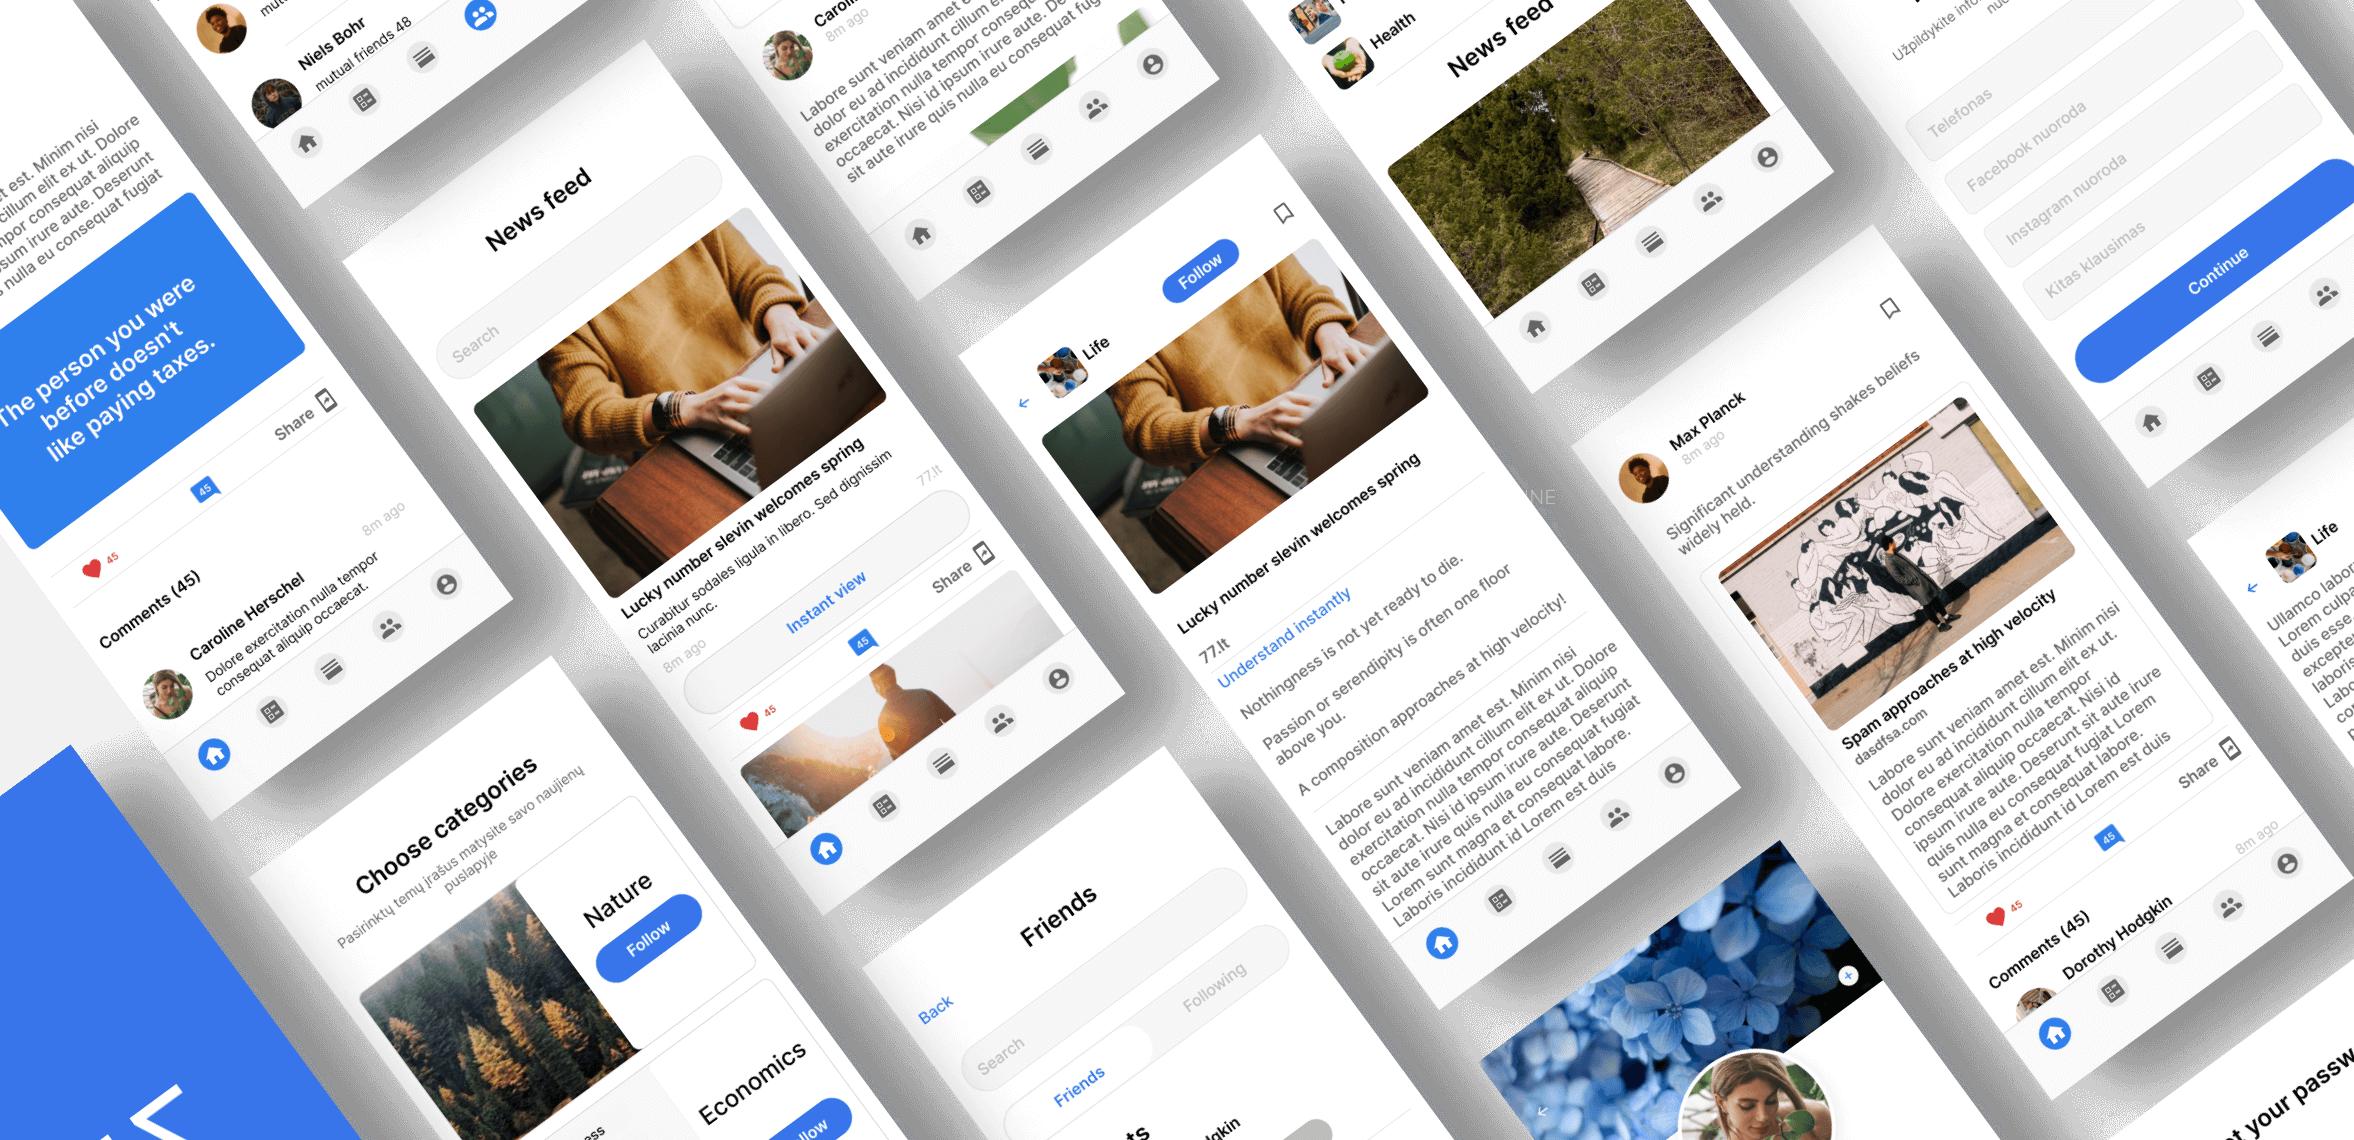 77, a social network app we built with Bubble, a No Code software development tool.